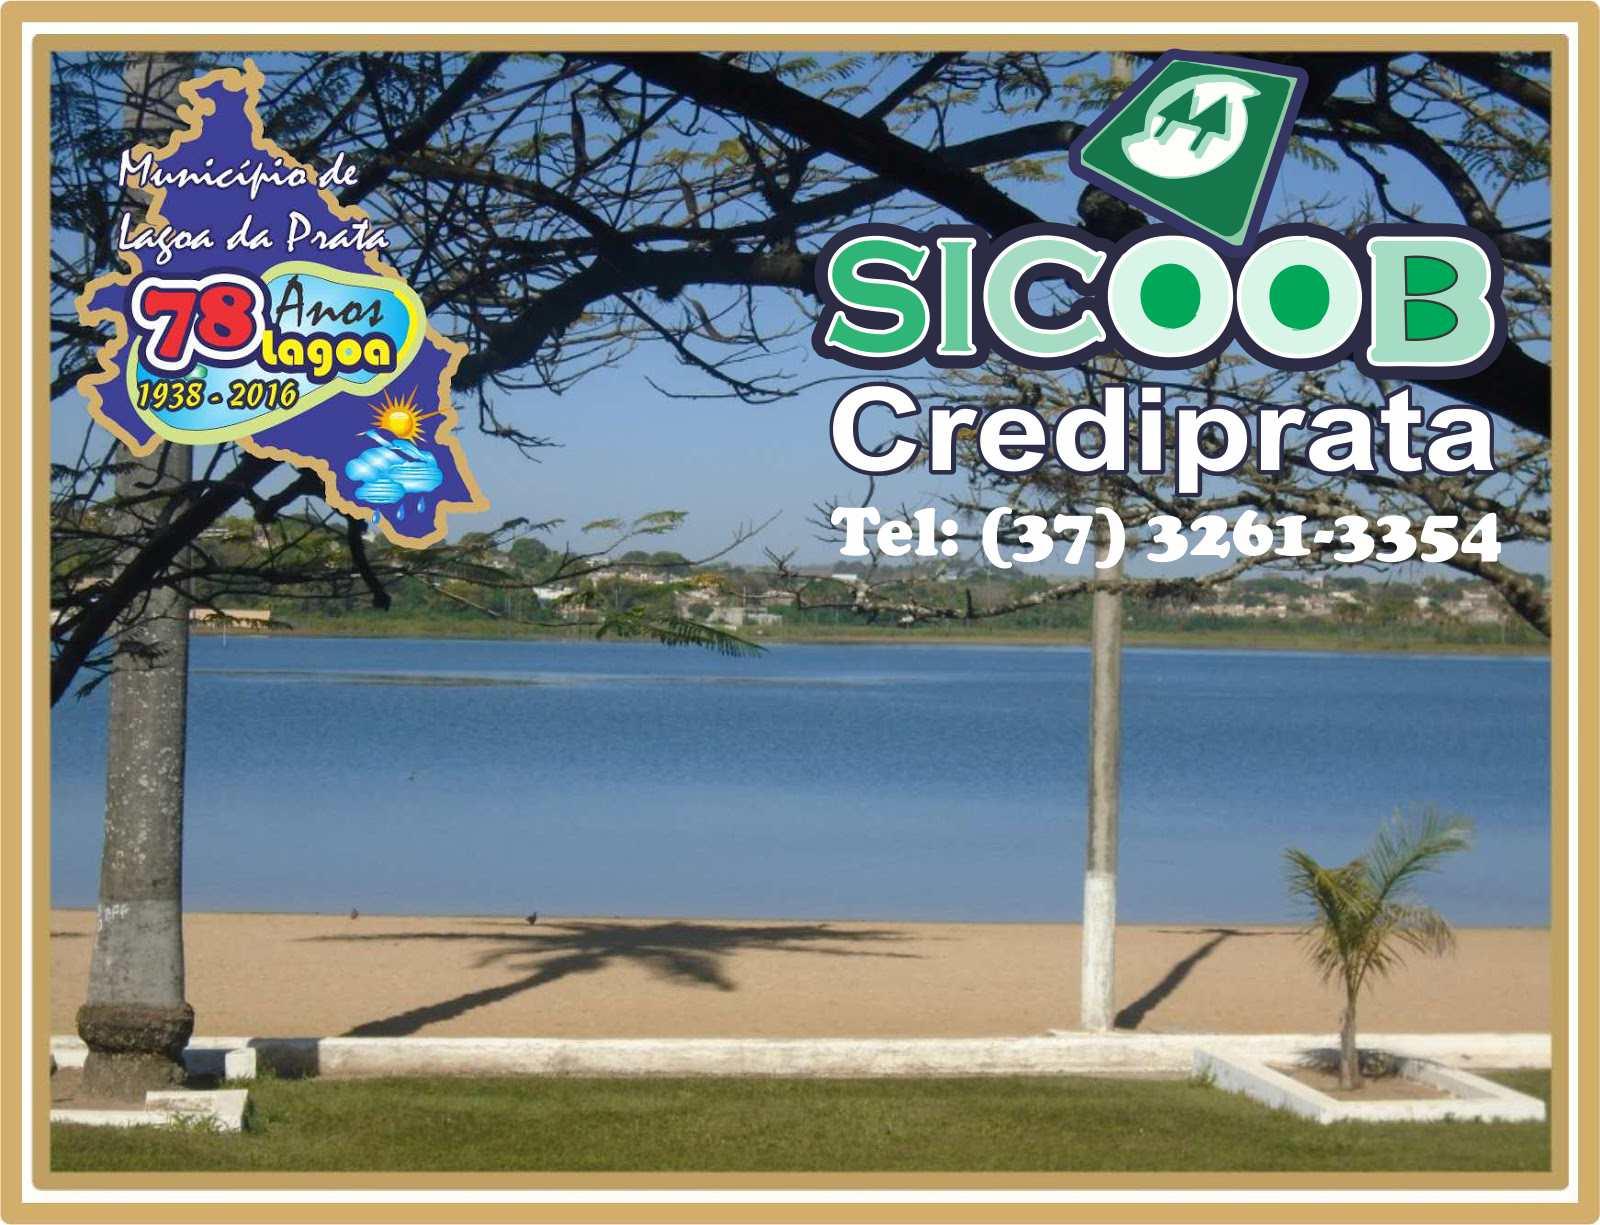 Sicoob Crediprata Nos 78 Anos de Lagoa da Prata